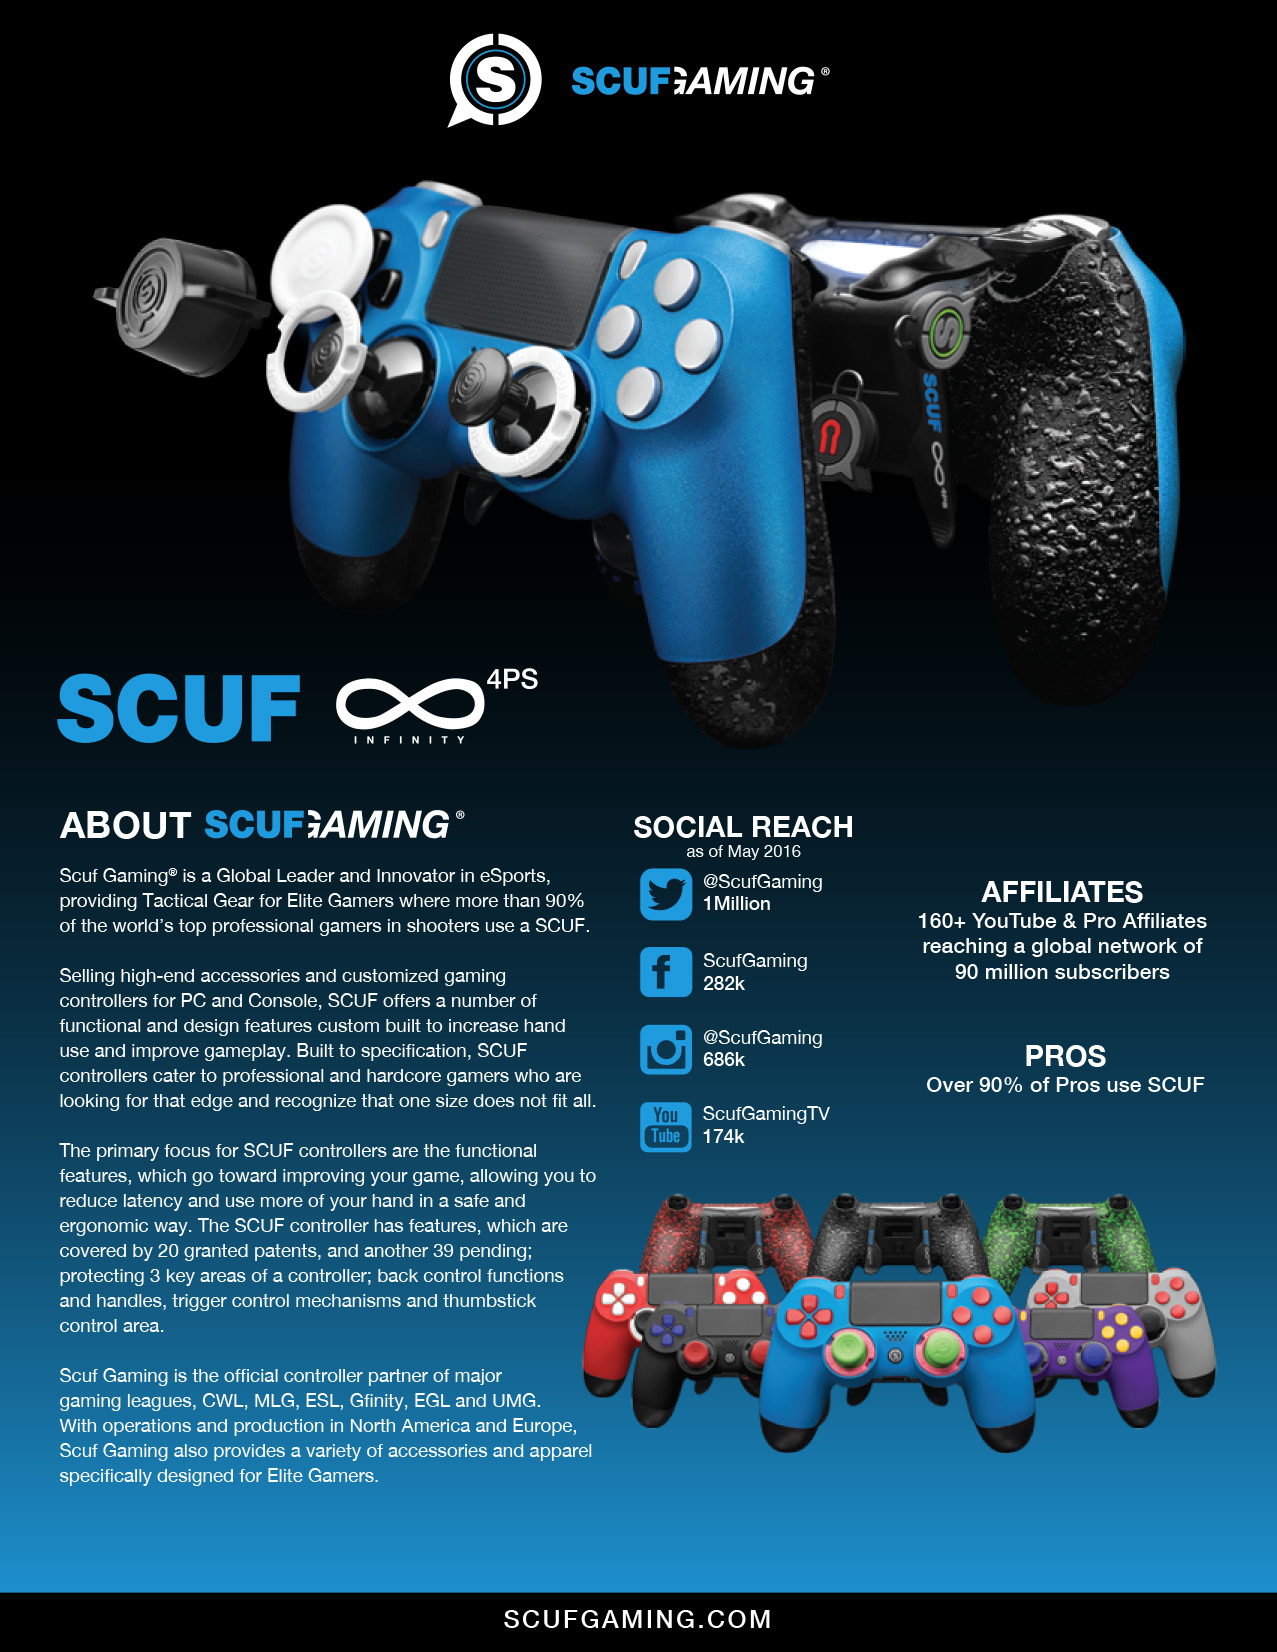 SCUF_Infinity4PS_brochure